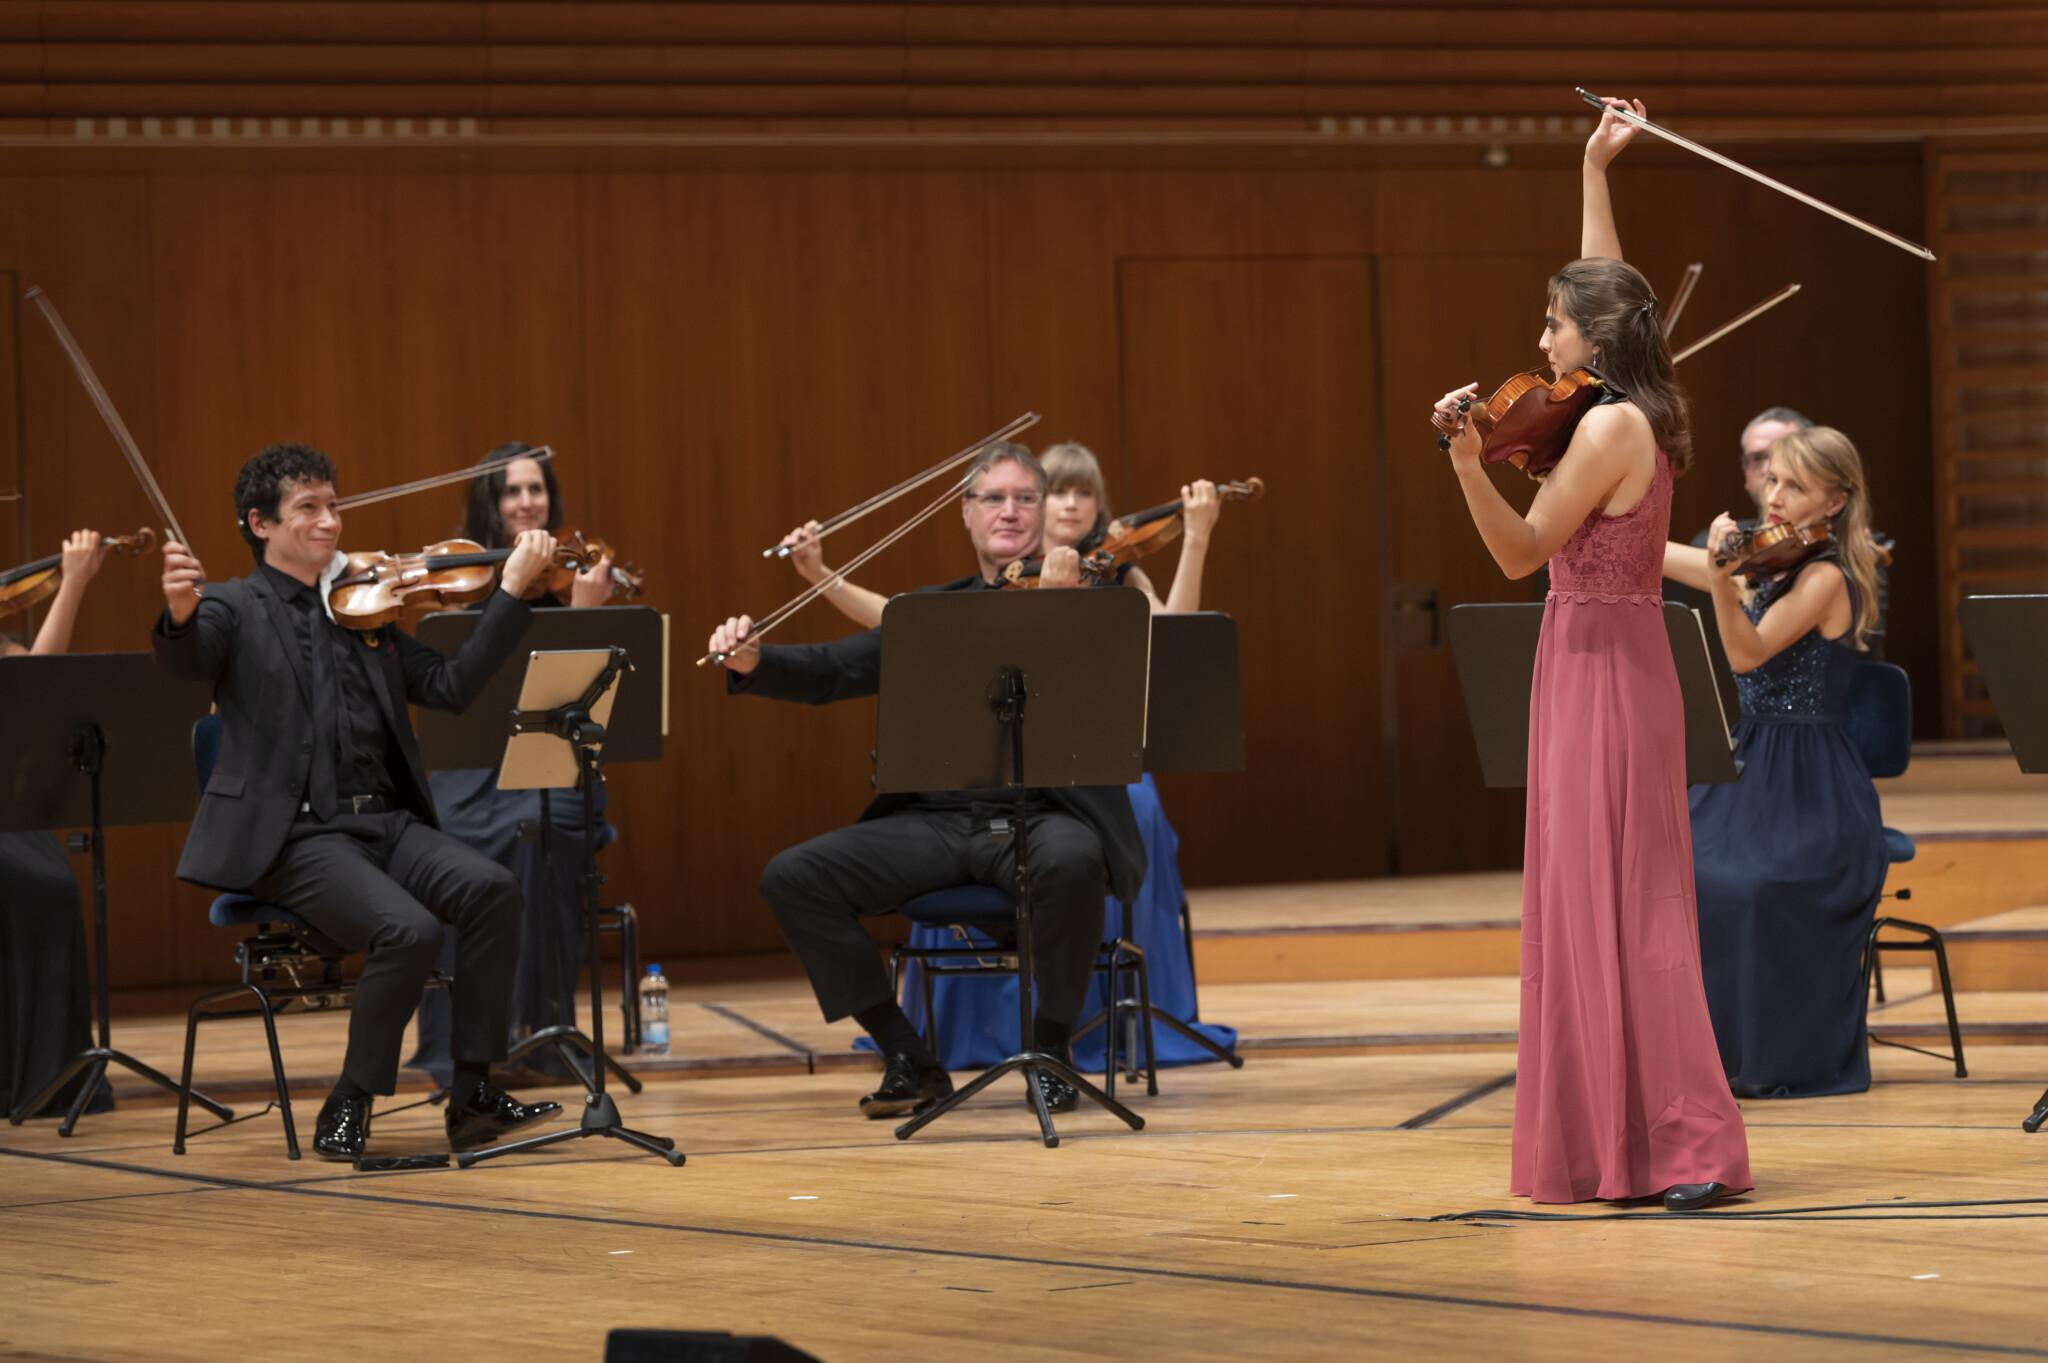 HSLU Musik Solistenkonzert 1 Luzern, den 23.06.2020 Copyright: HSLU Musik/Priska Ketterer